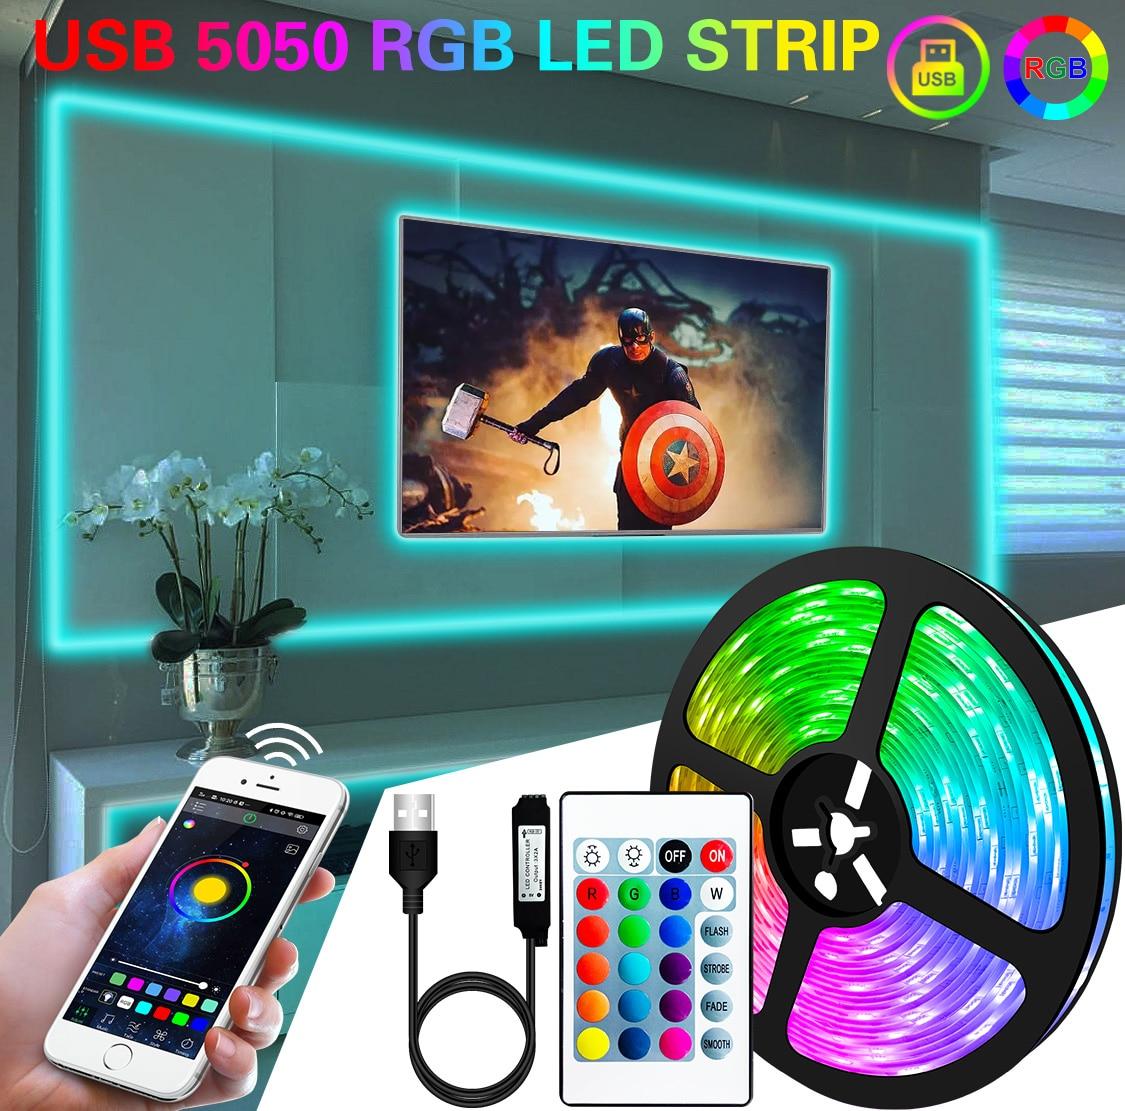 1M 2M 3M 5M 10M LED Strip Light Flexible Lamp USB Bluetooth Led Lighting 5050 RGB Tape Diode For TikTok Light TV BackLight Party